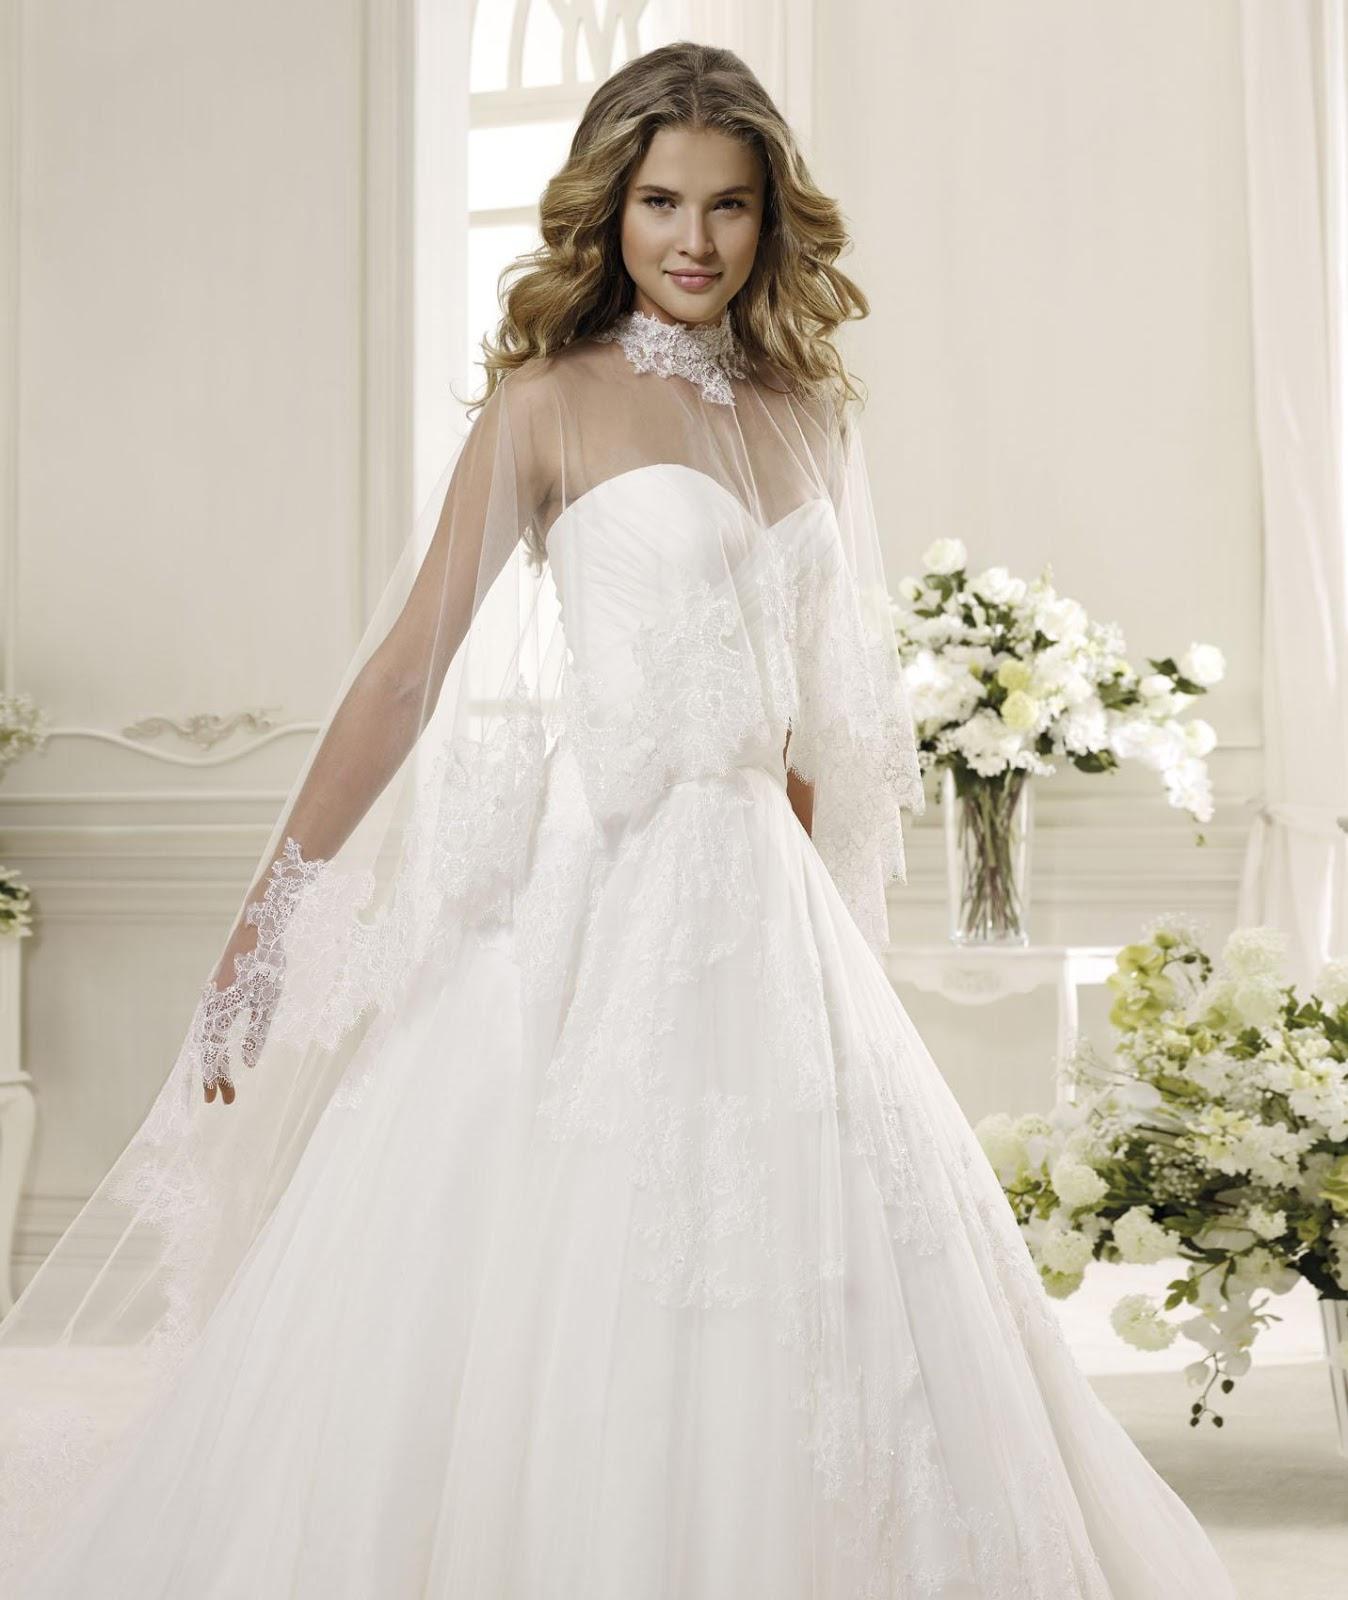 http://www.aislestyle.co.uk/generous-aline-sweetheart-beadingsequins-lace-sweepbrush-train-tulle-wedding-dresses-p-2708.html